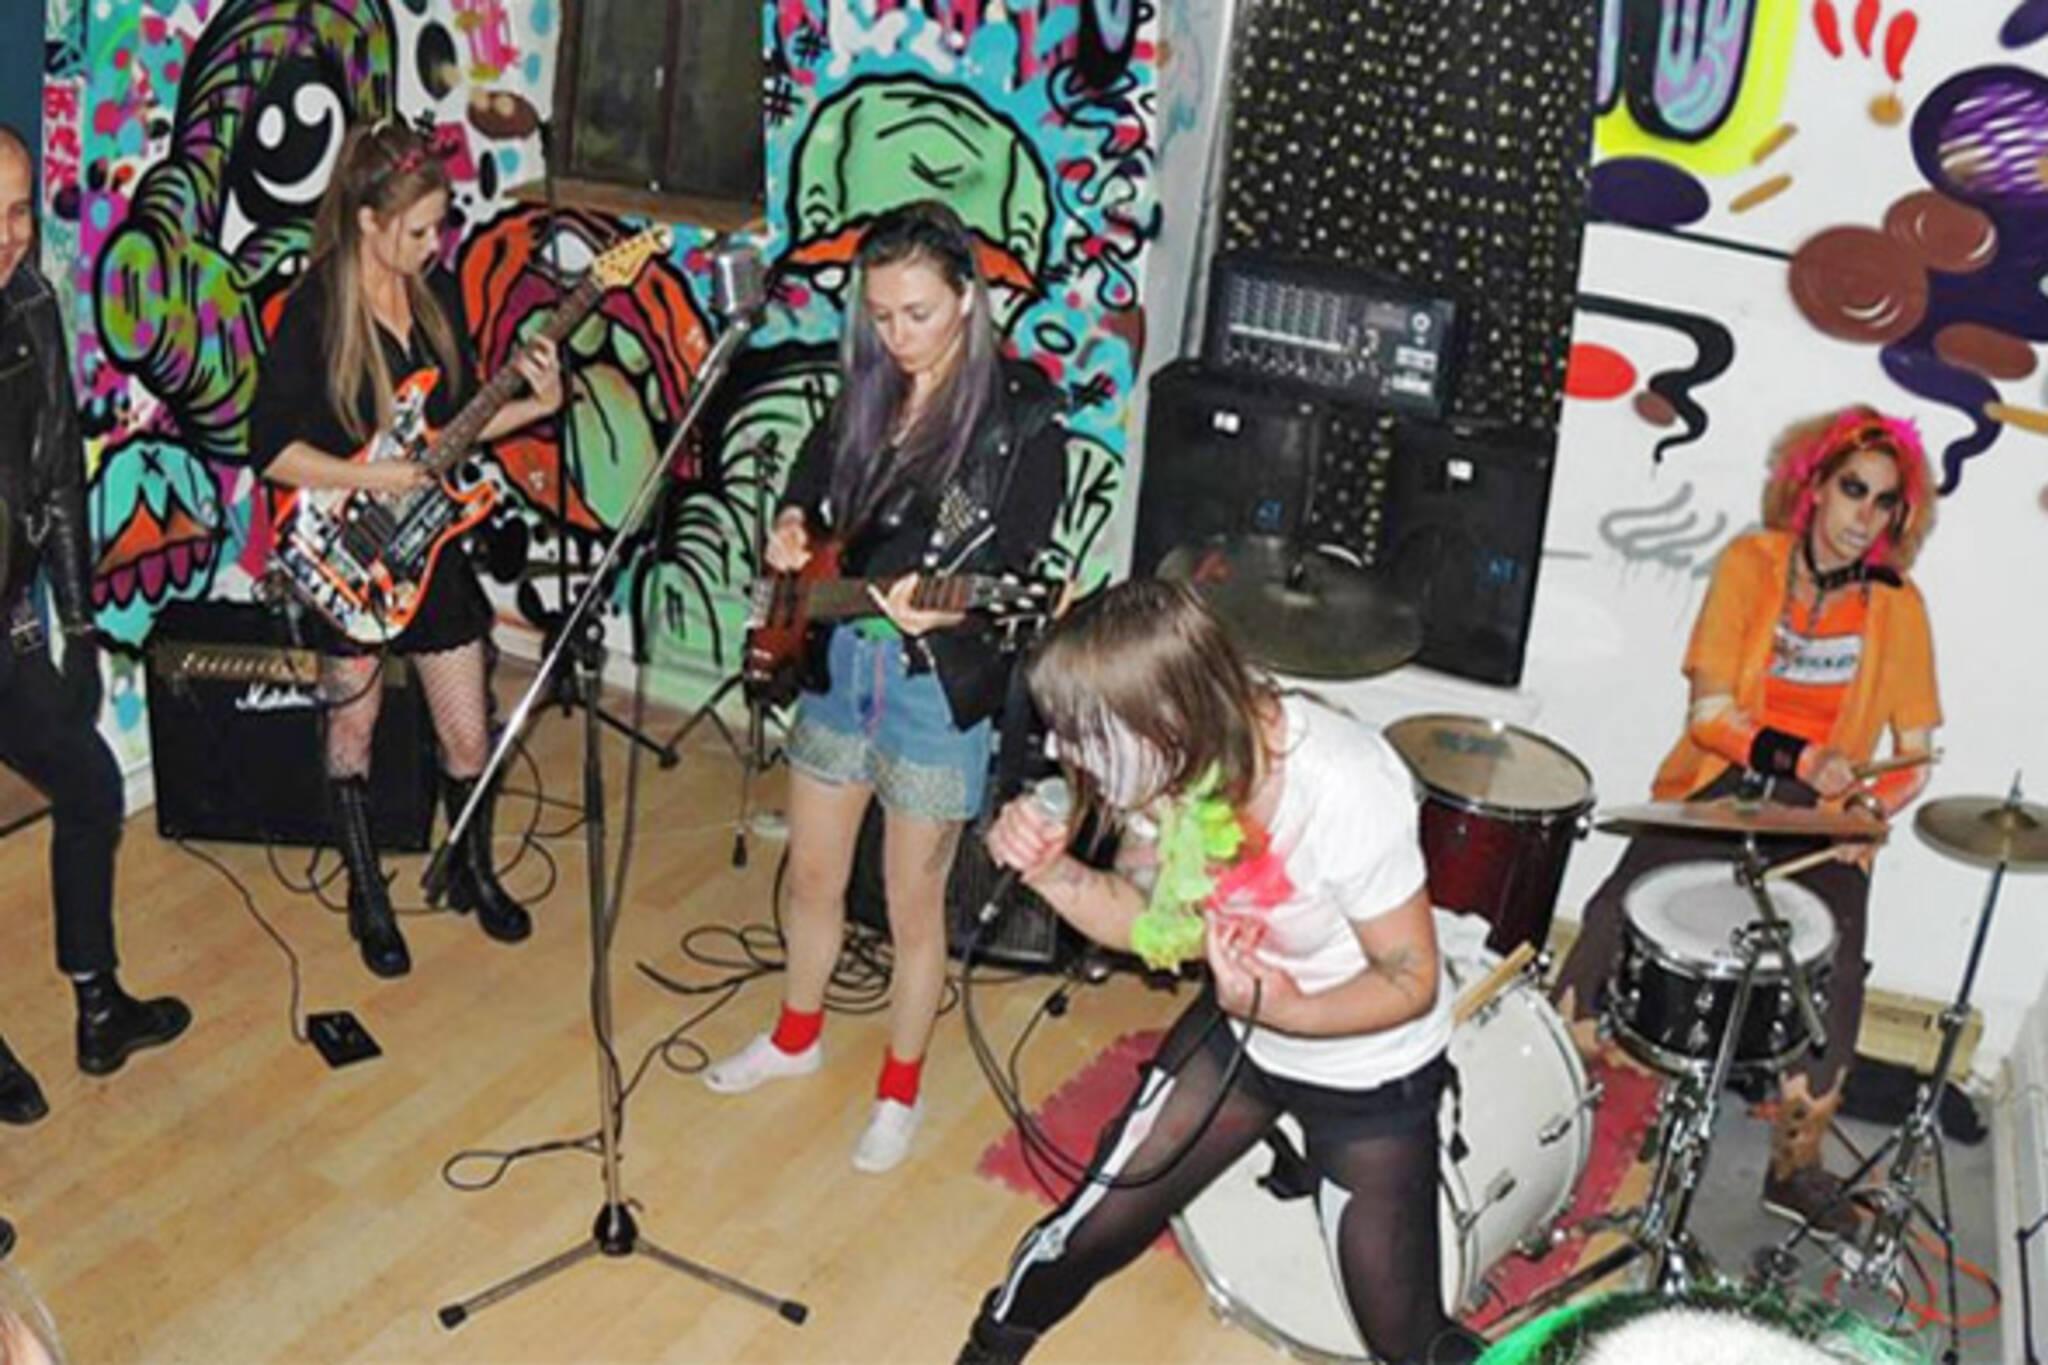 Girls just wanna have punk